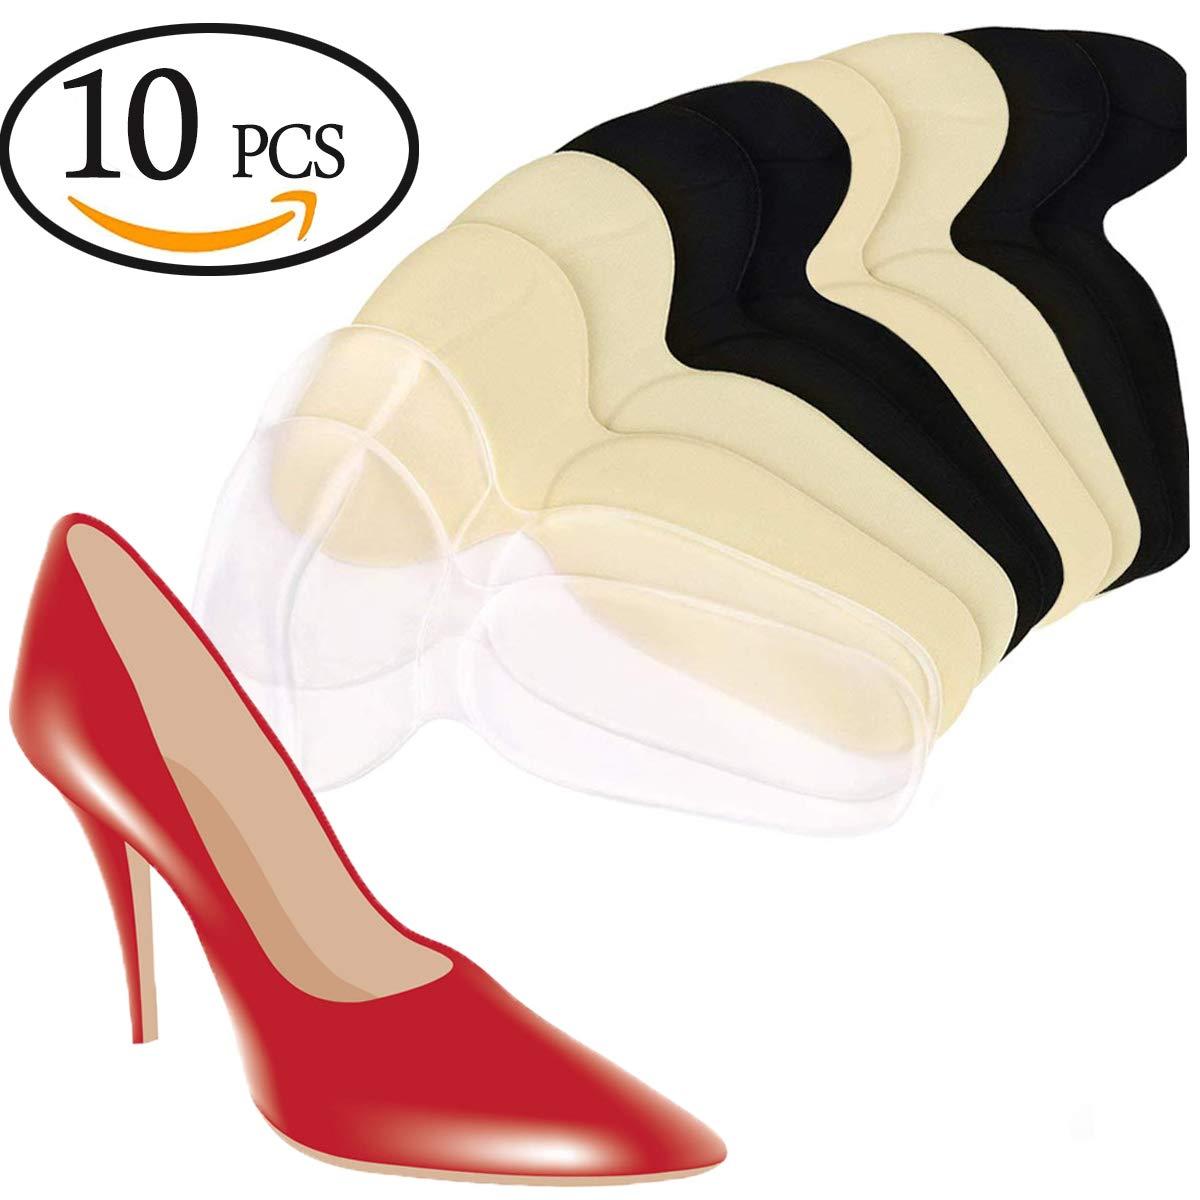 Heel Grips Shoes Too Big - 5 Pairs